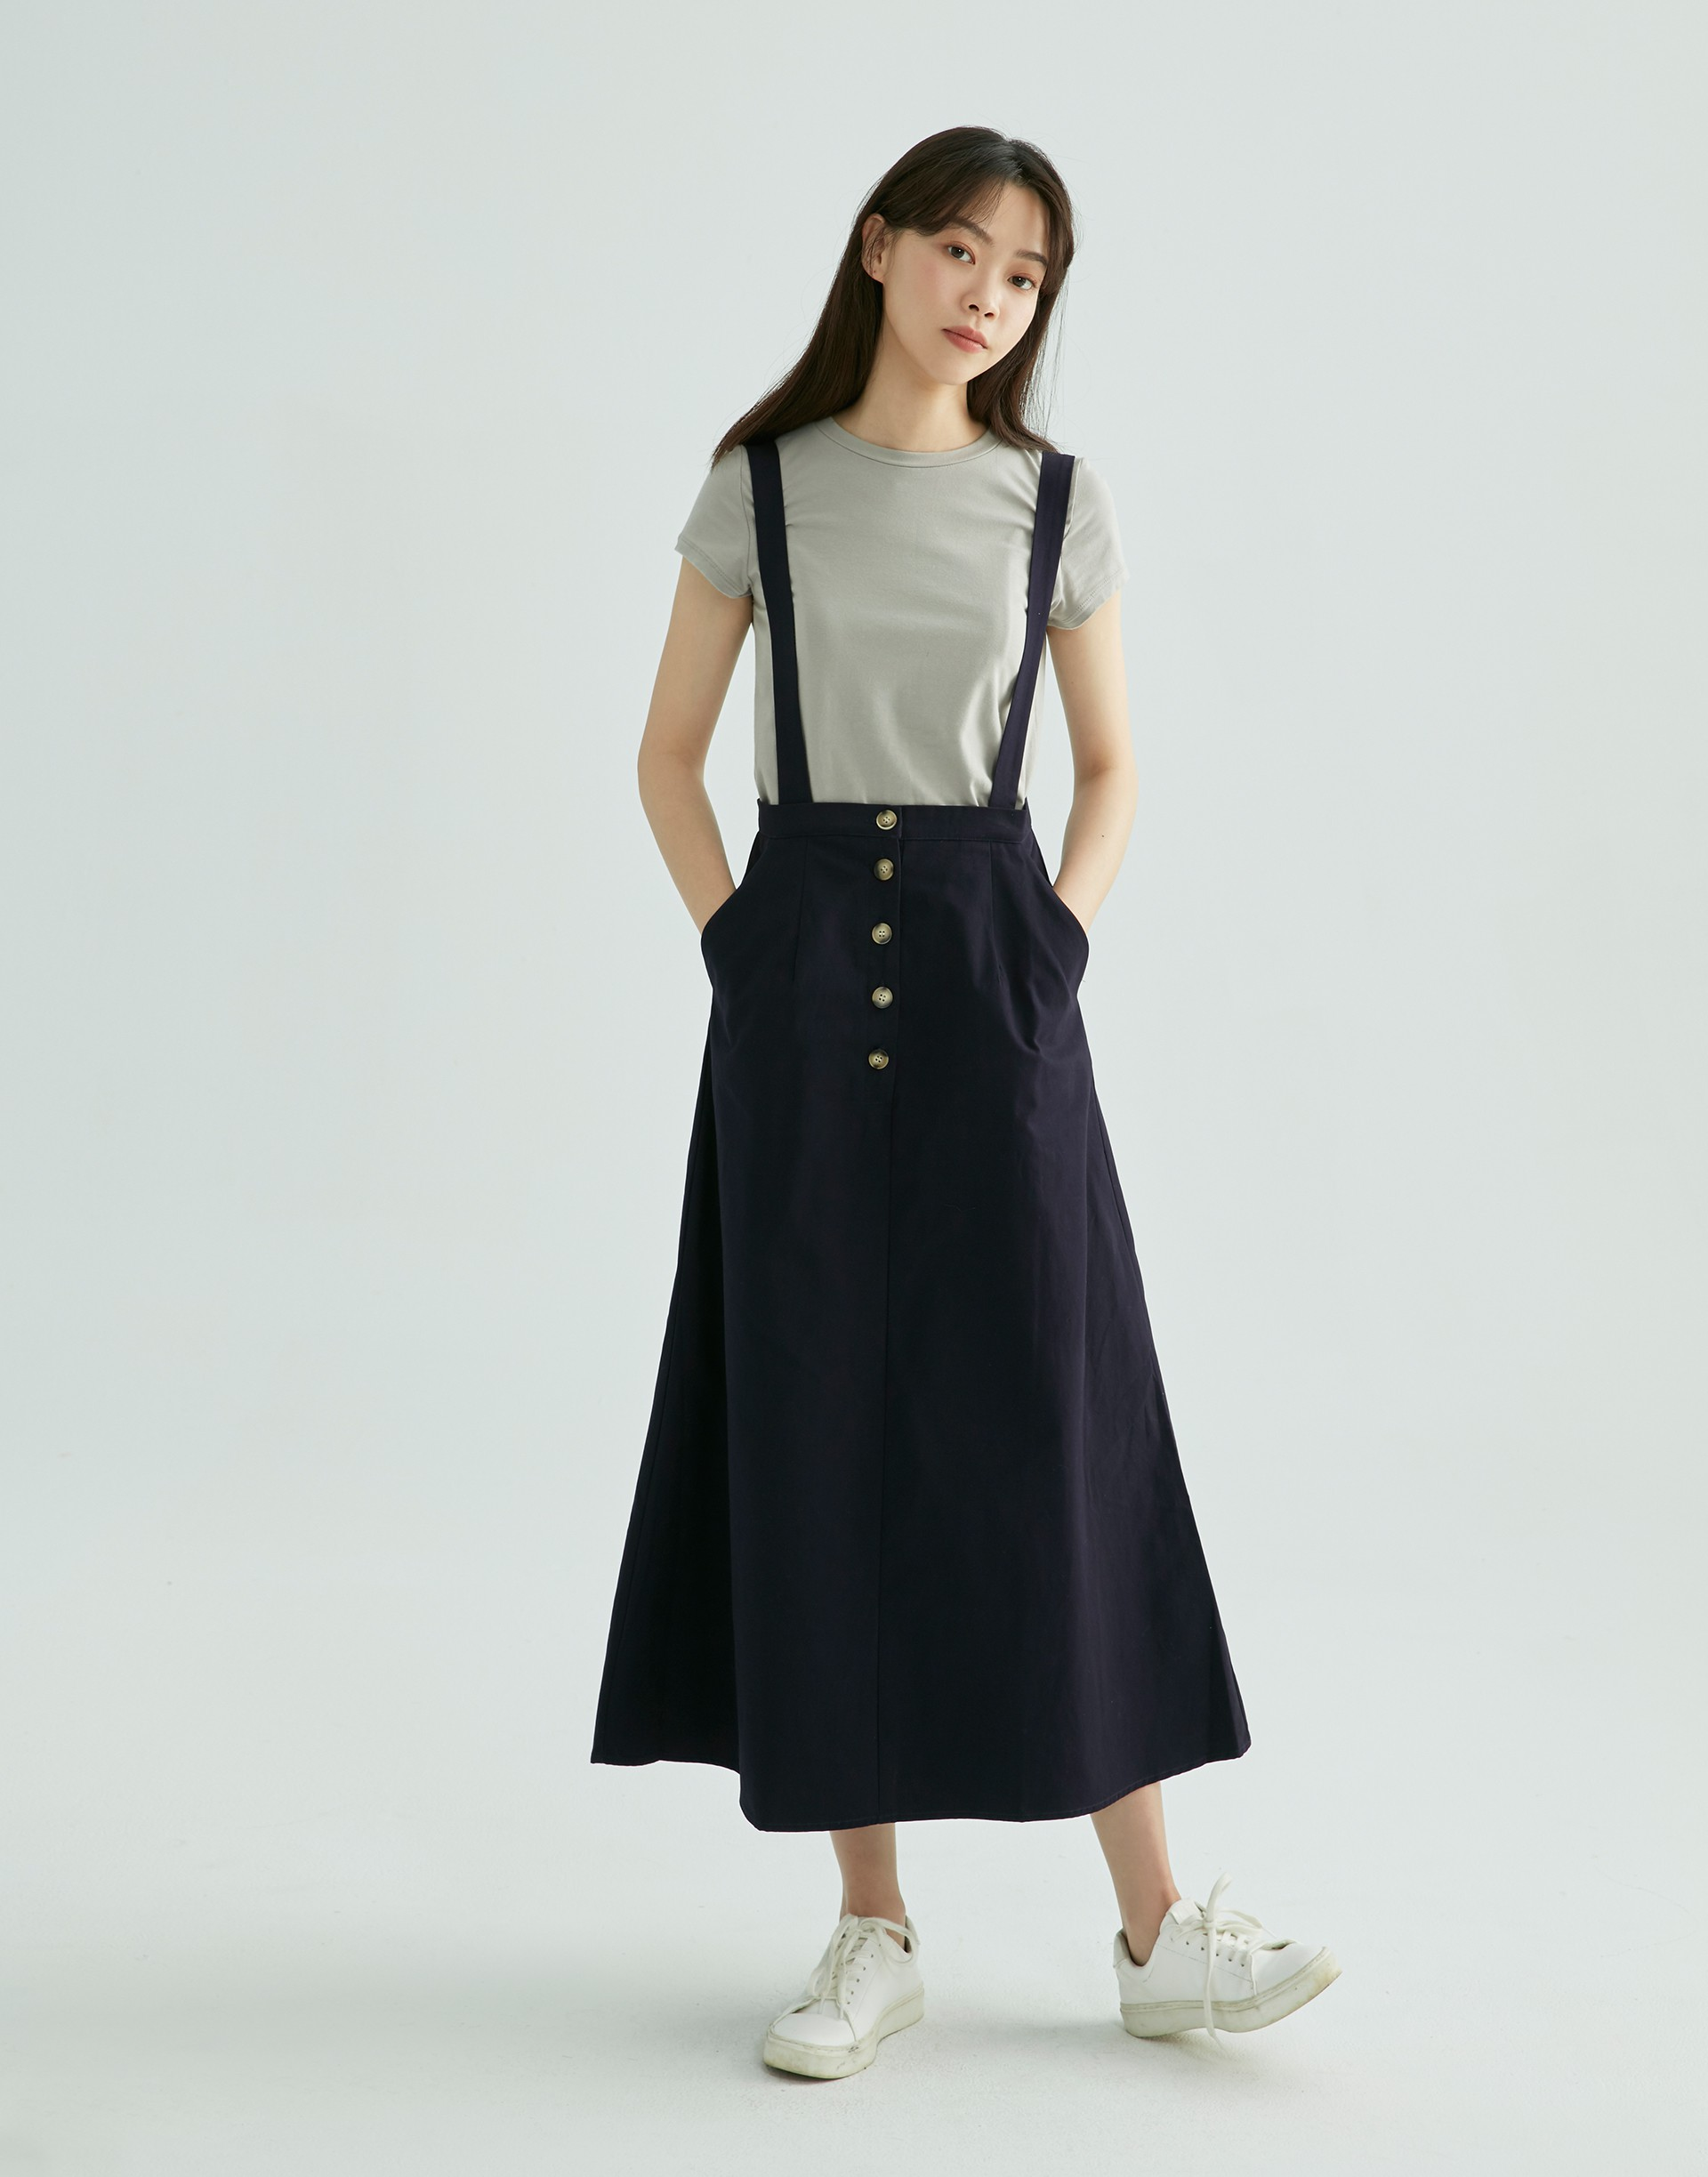 GENQUO+休閒排釦吊帶裙-女